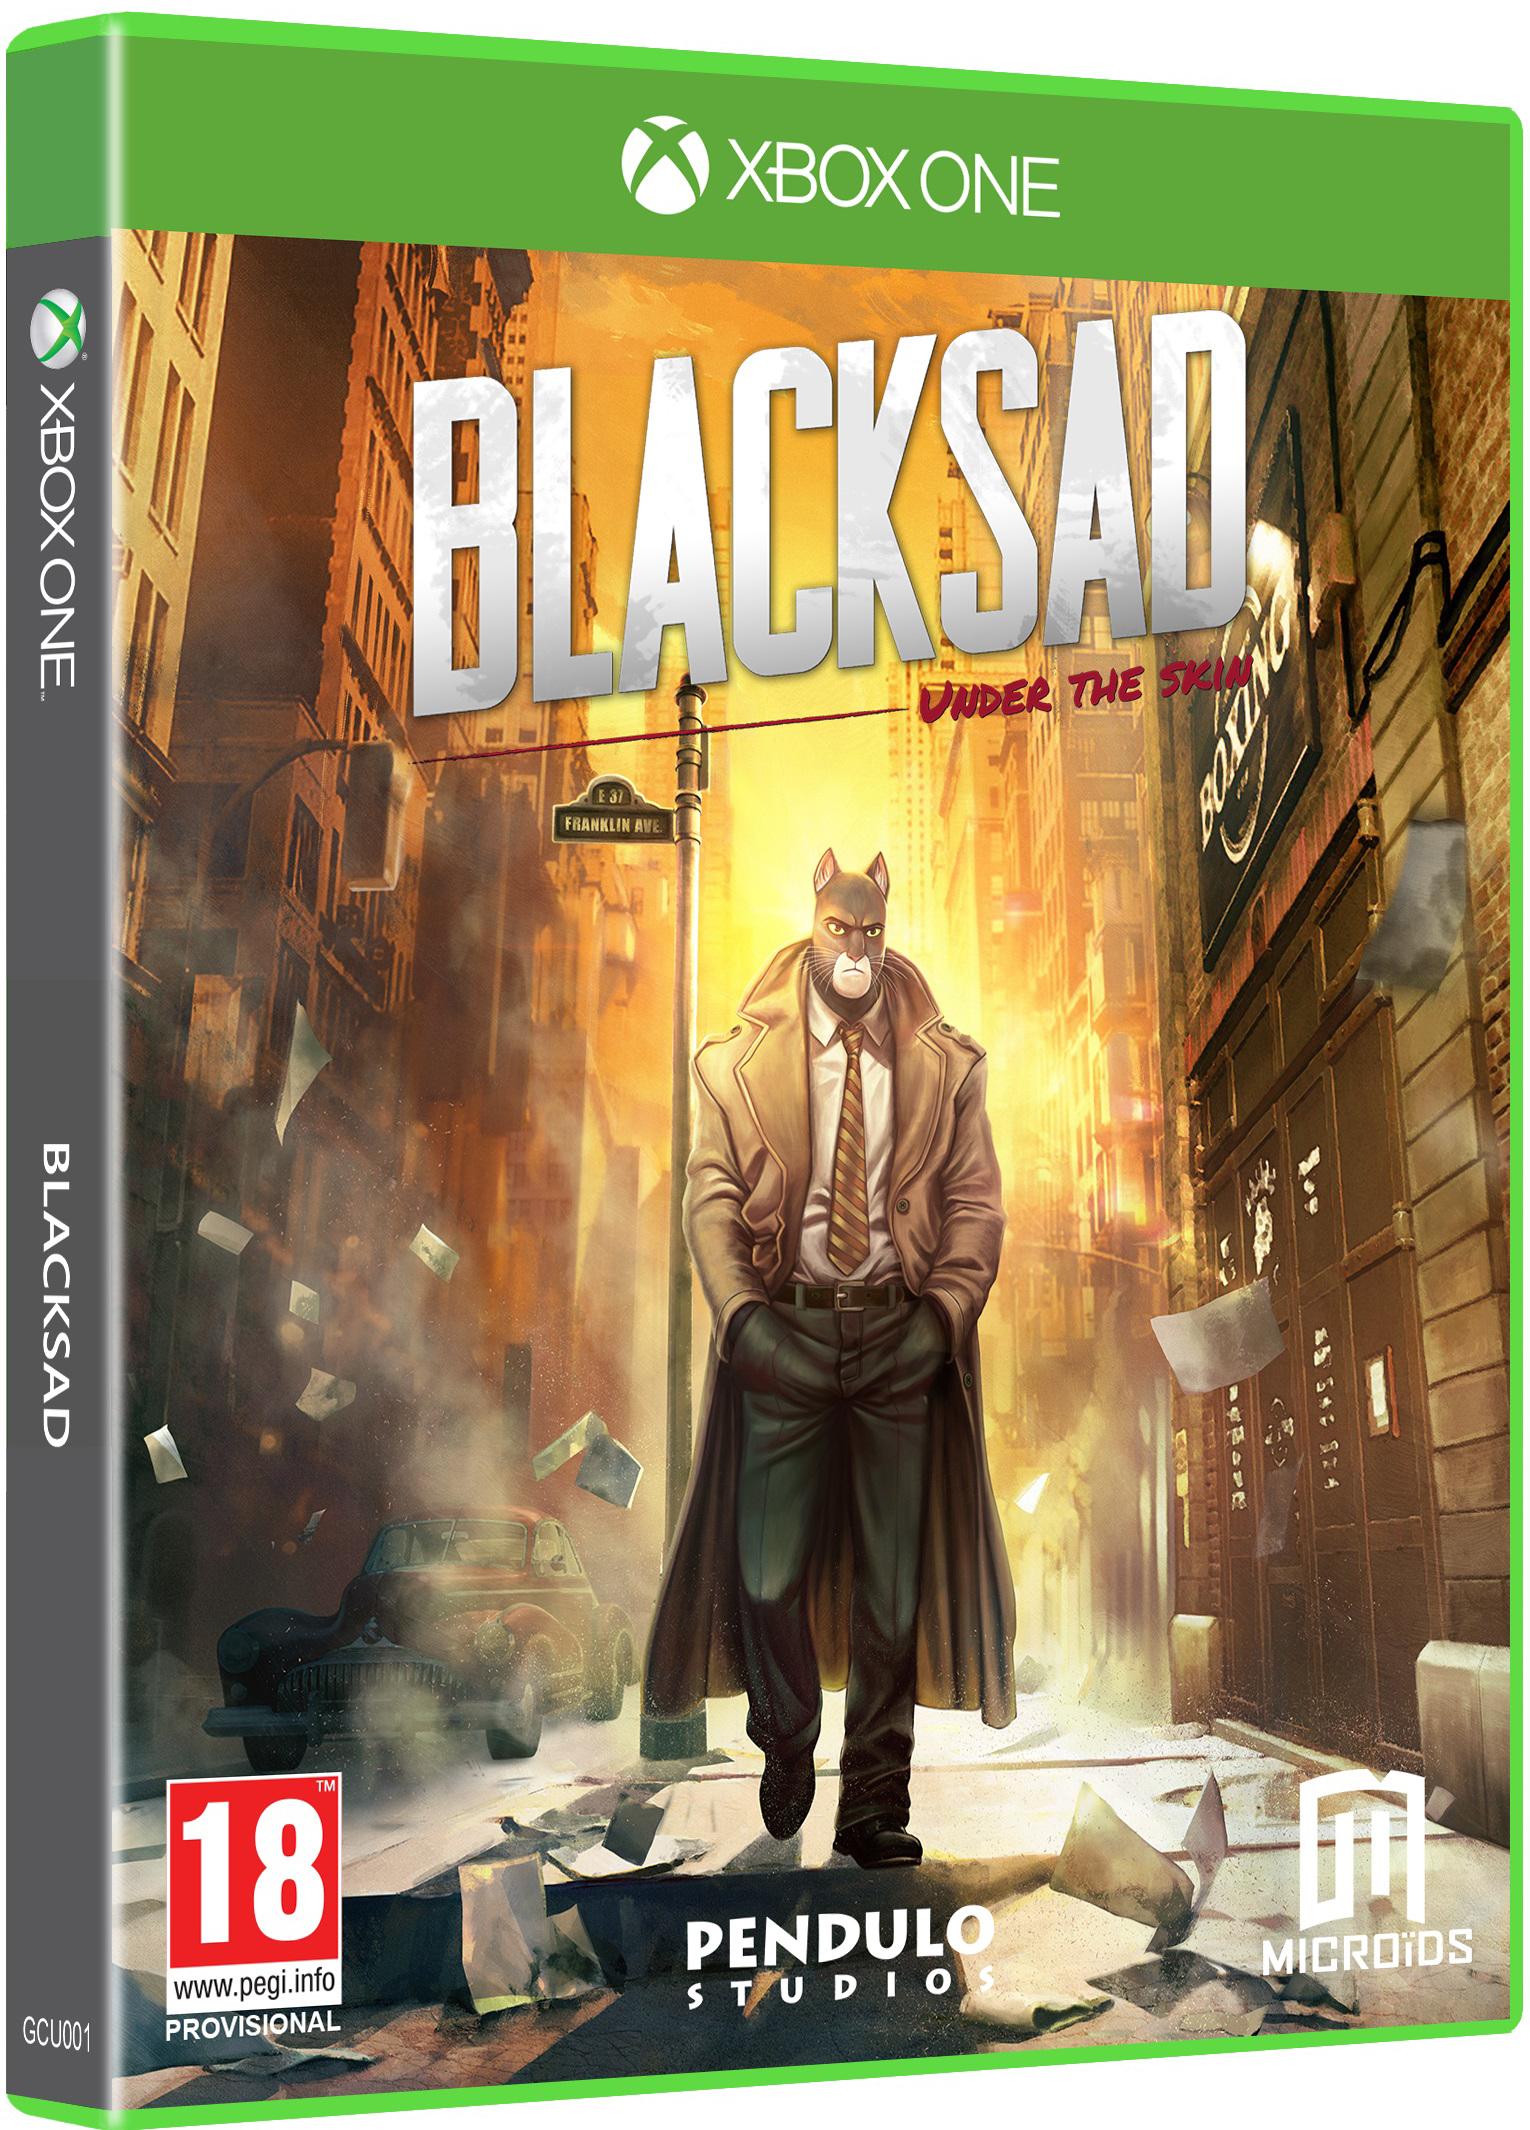 Blacksad: Under The Skin. Коллекционное издание [Xbox One] недорого